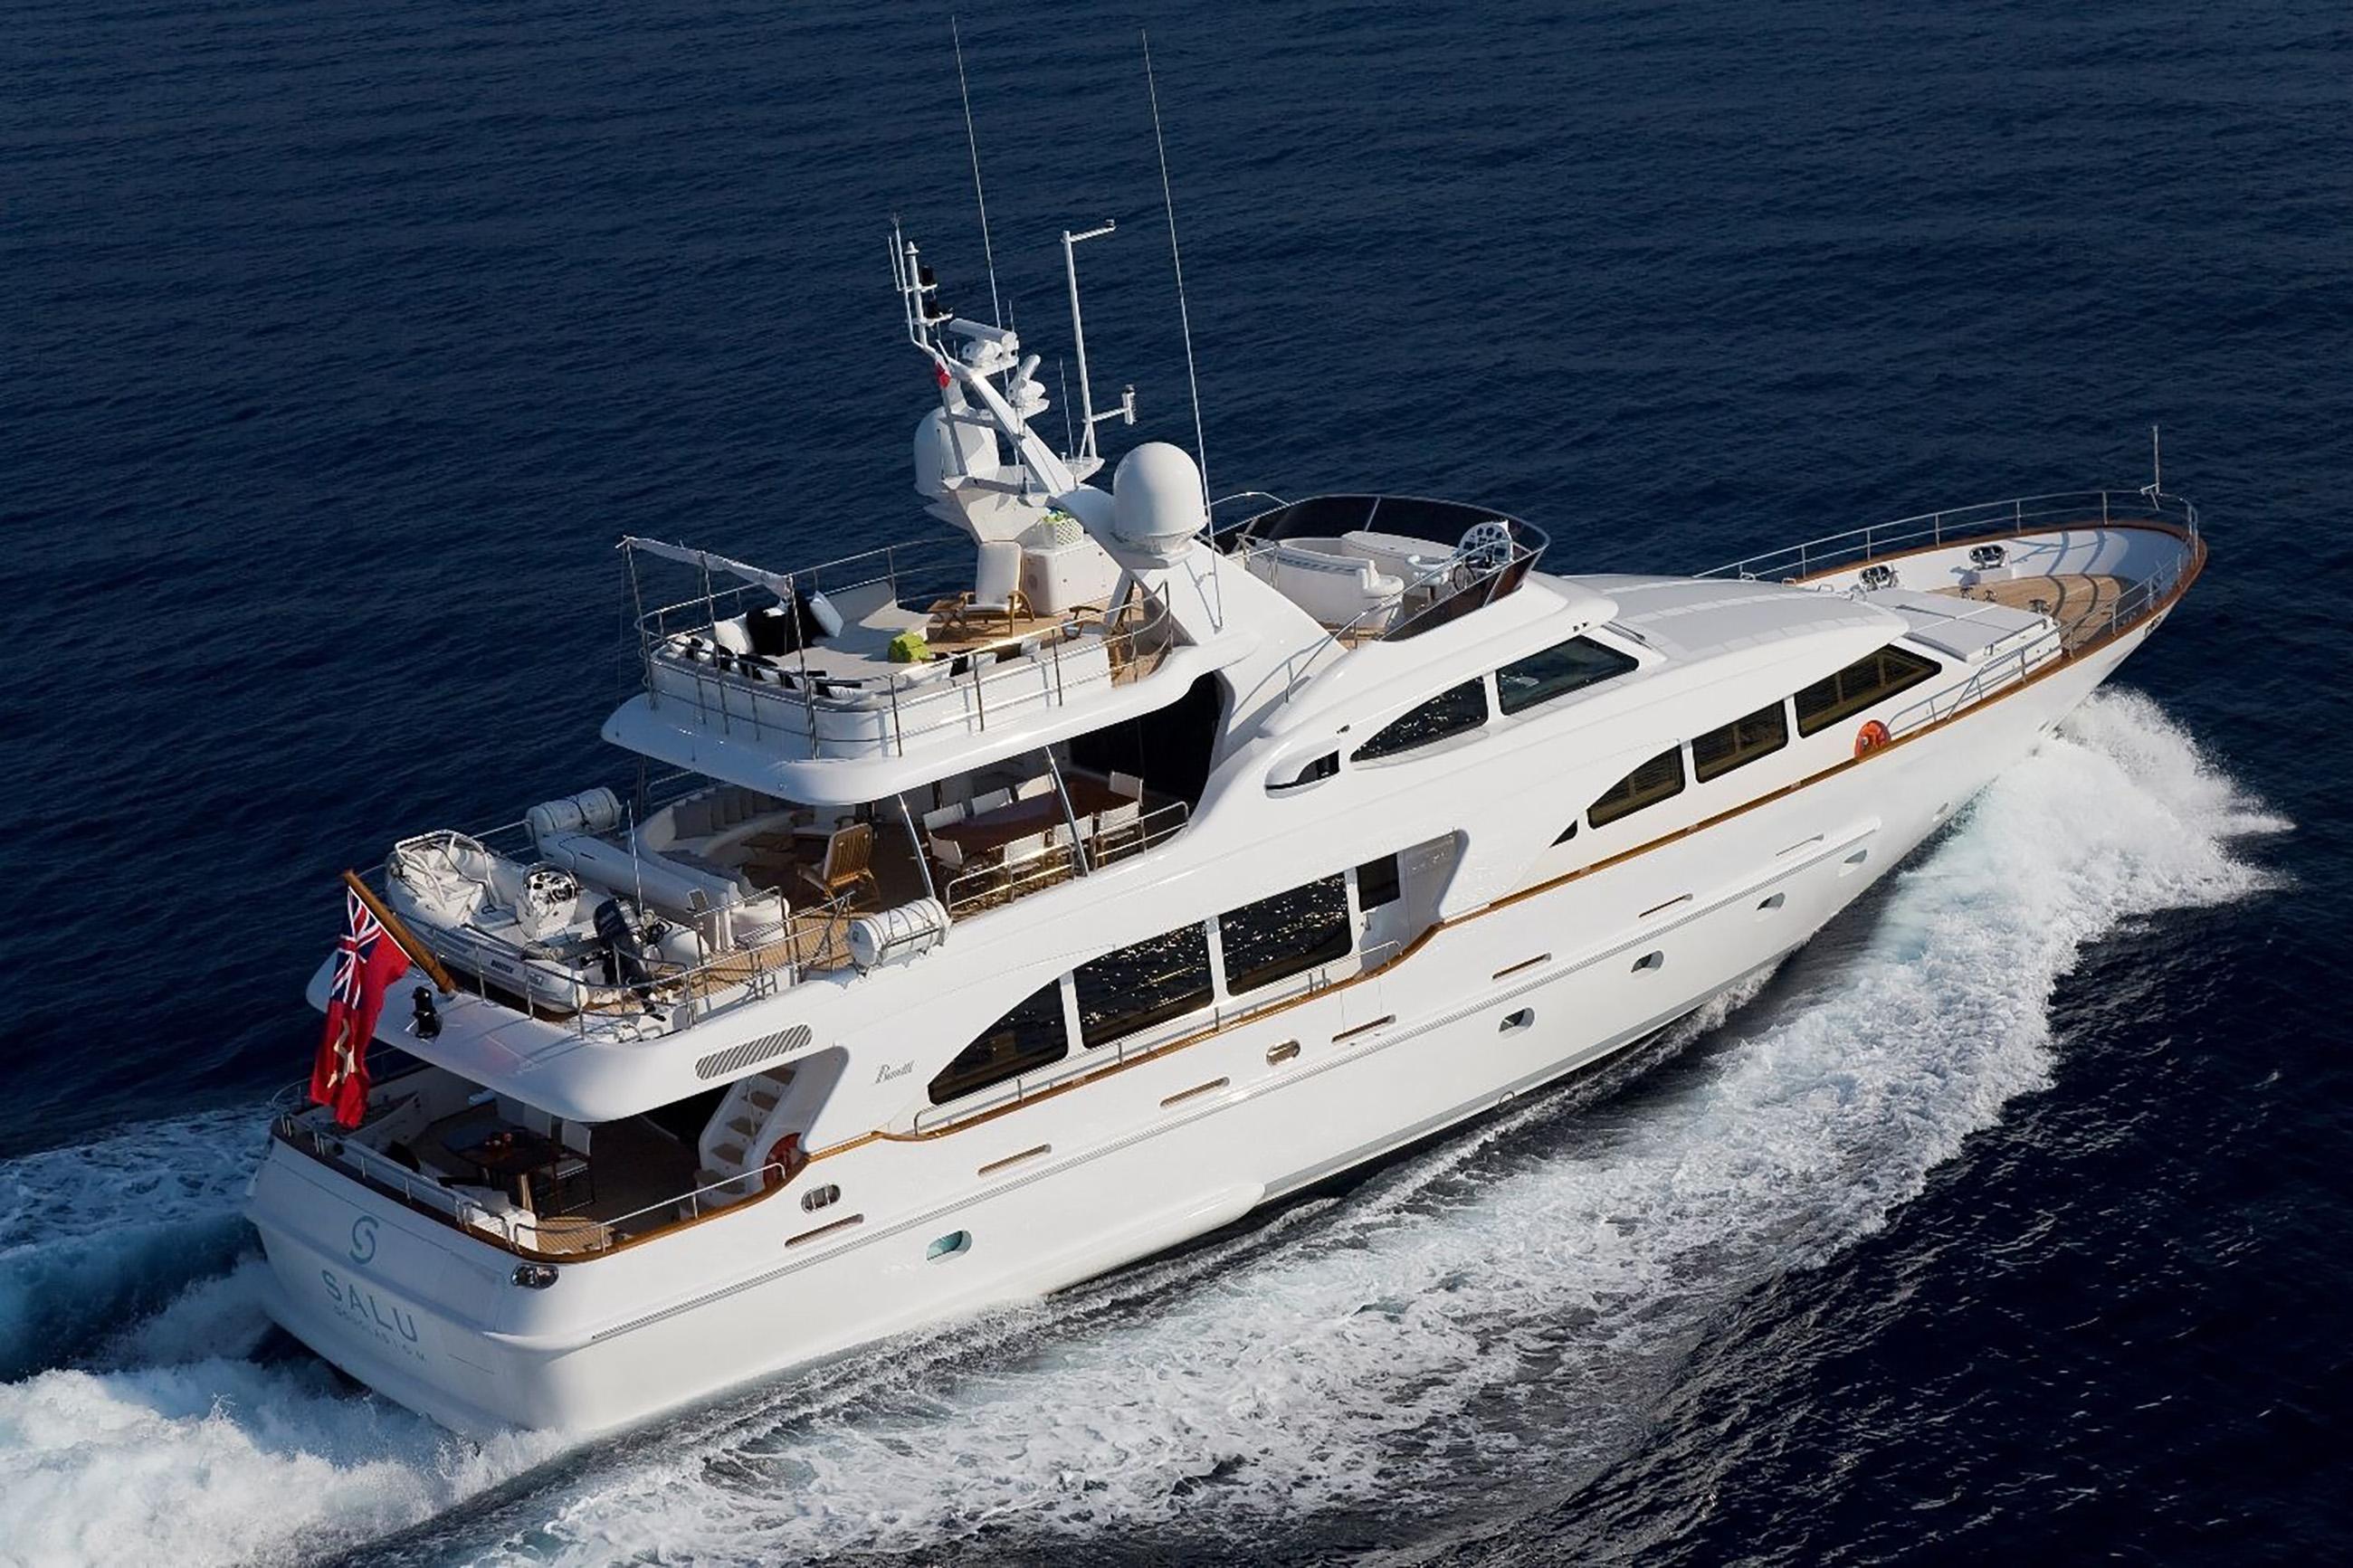 Luxury motor yacht SALU available in the Western Mediterranean